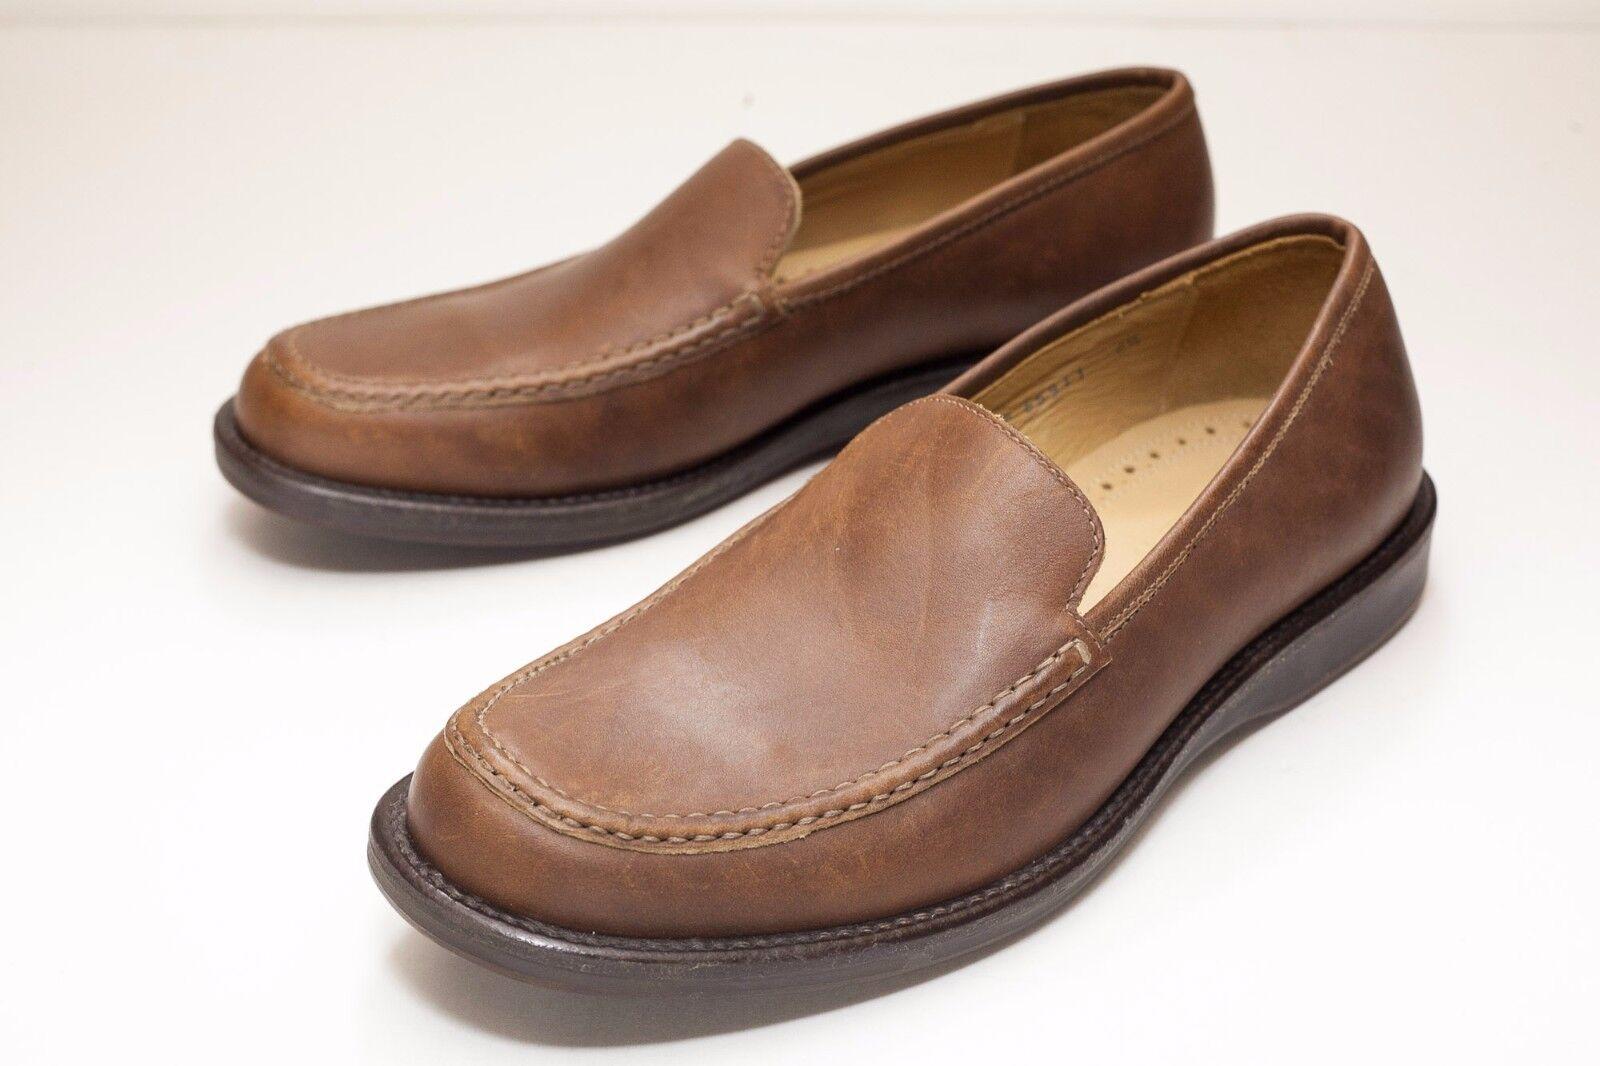 J.Crew 8.5 Brown Loafers Men's shoes - Italian